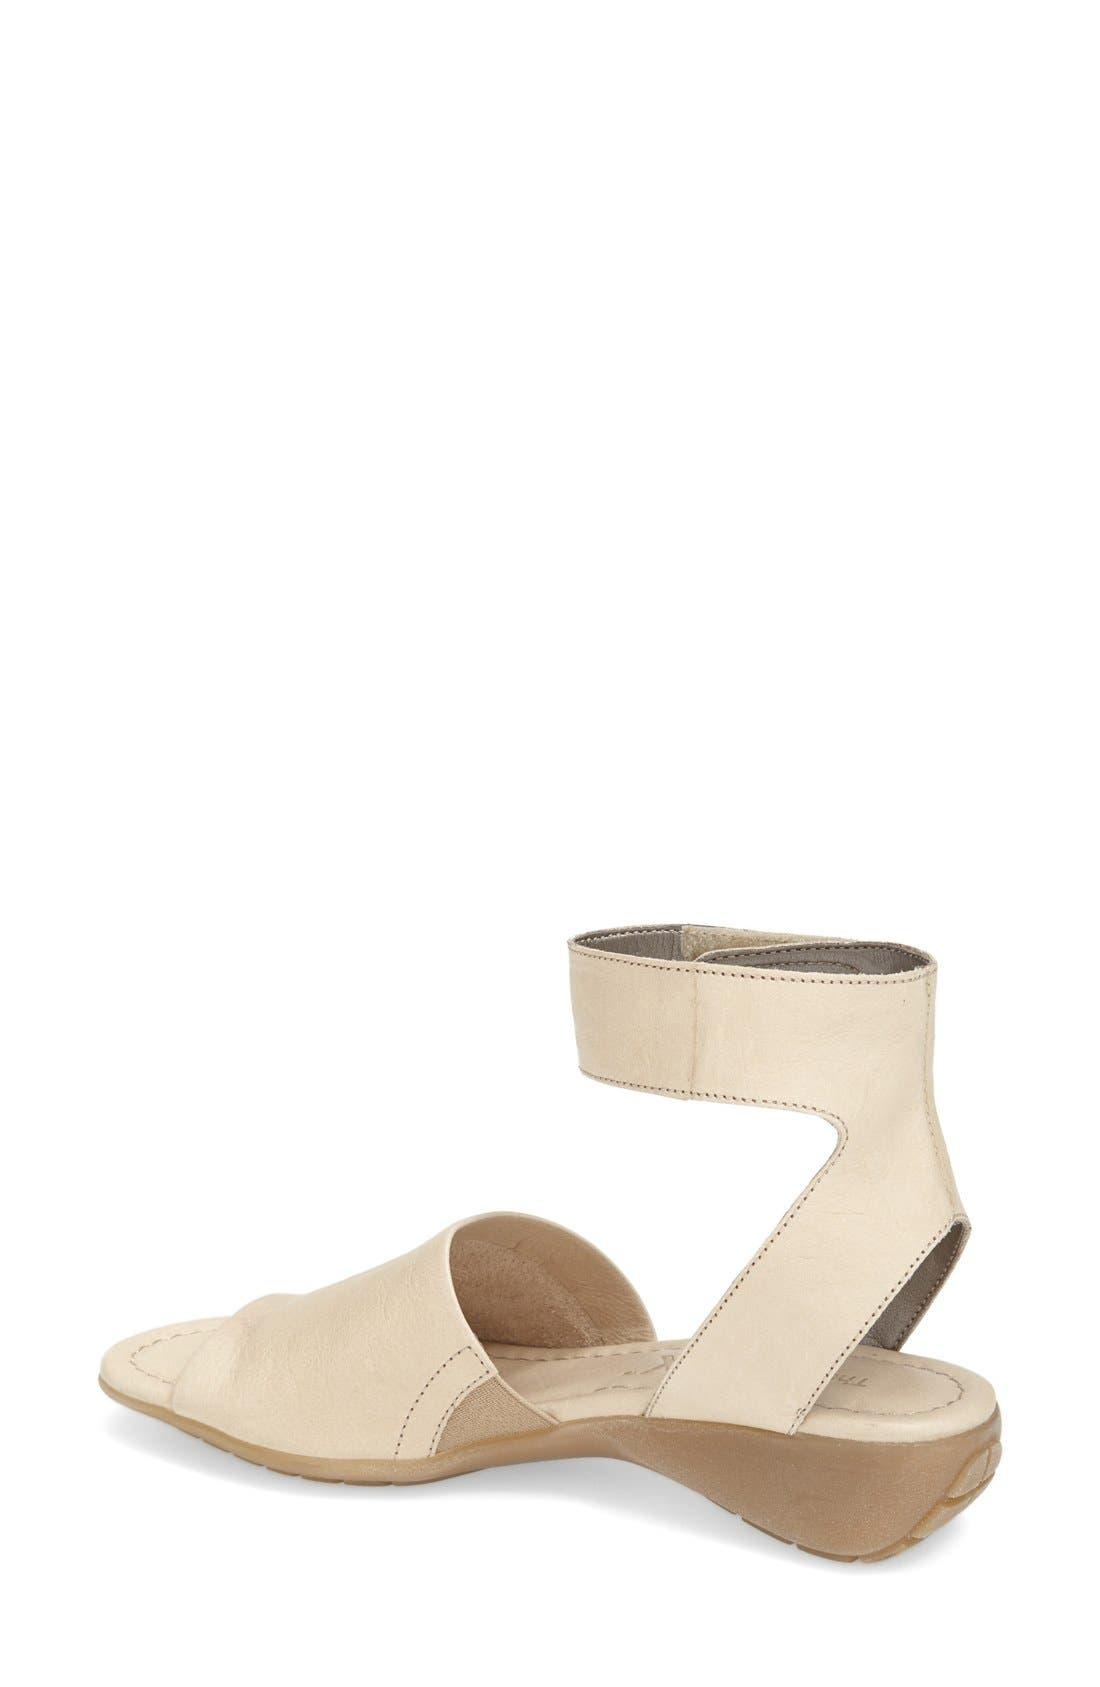 'Beglad' Leather Ankle Strap Sandal,                             Alternate thumbnail 30, color,